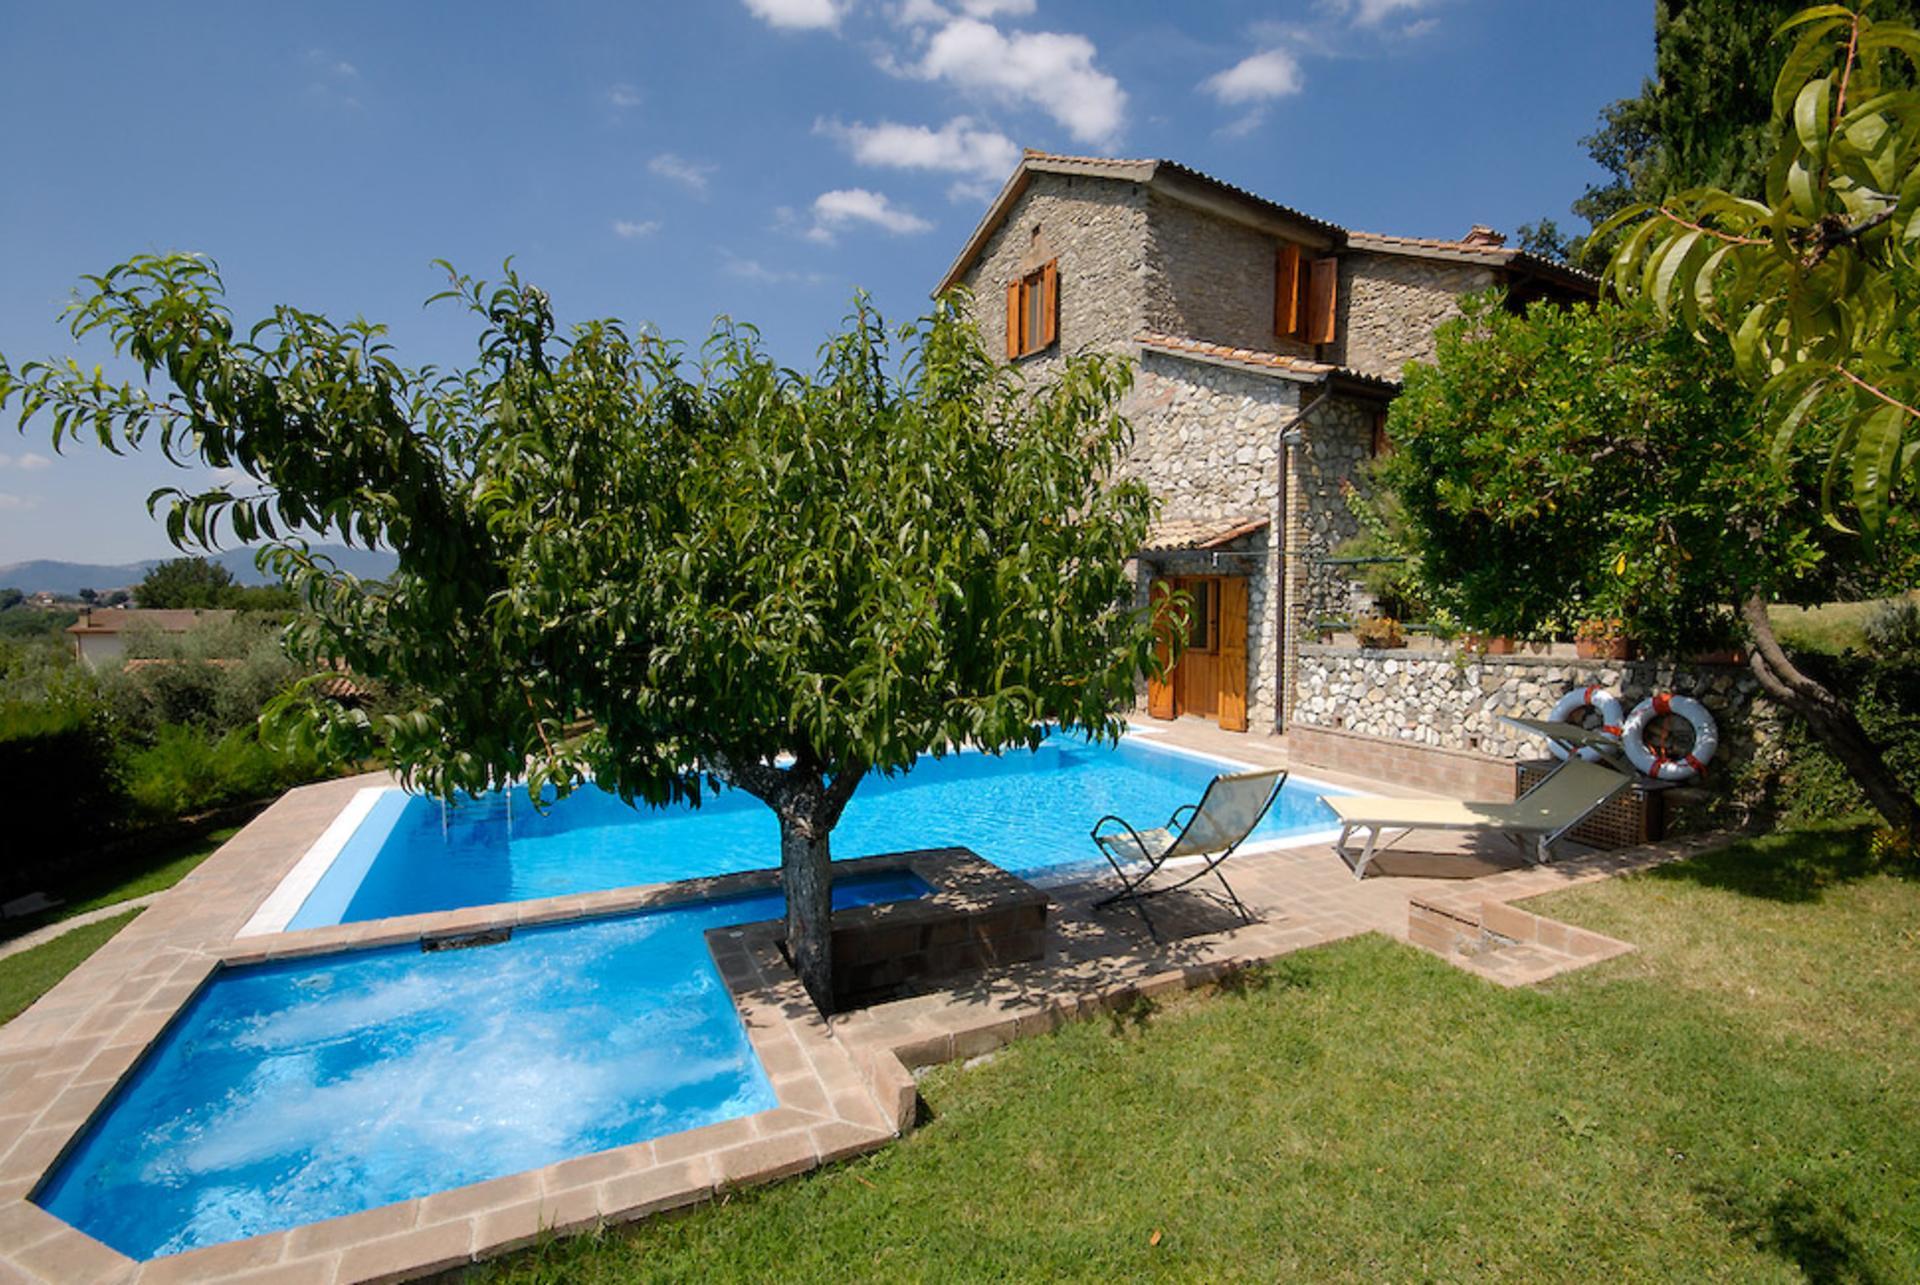 Outdoor pool and jacuzzi, Casa Alessia, Lazio, Selci in Sabina.